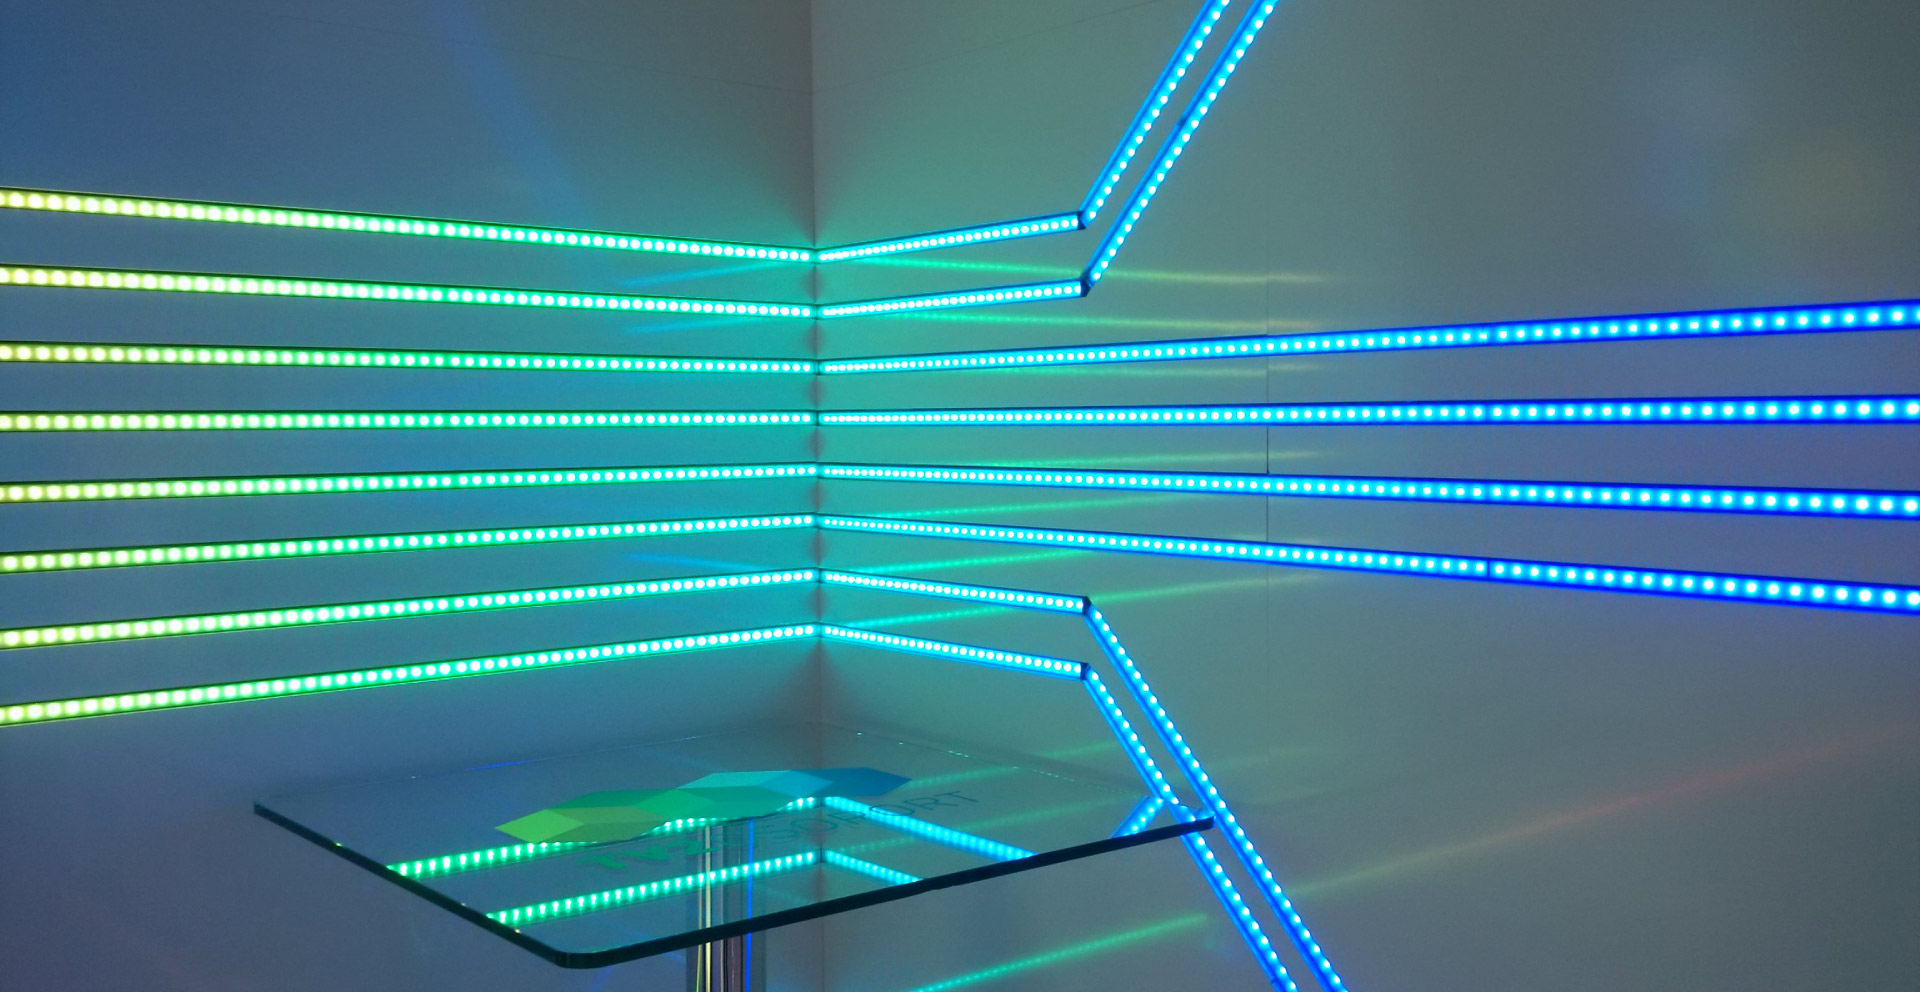 Indoor ledblade visuals